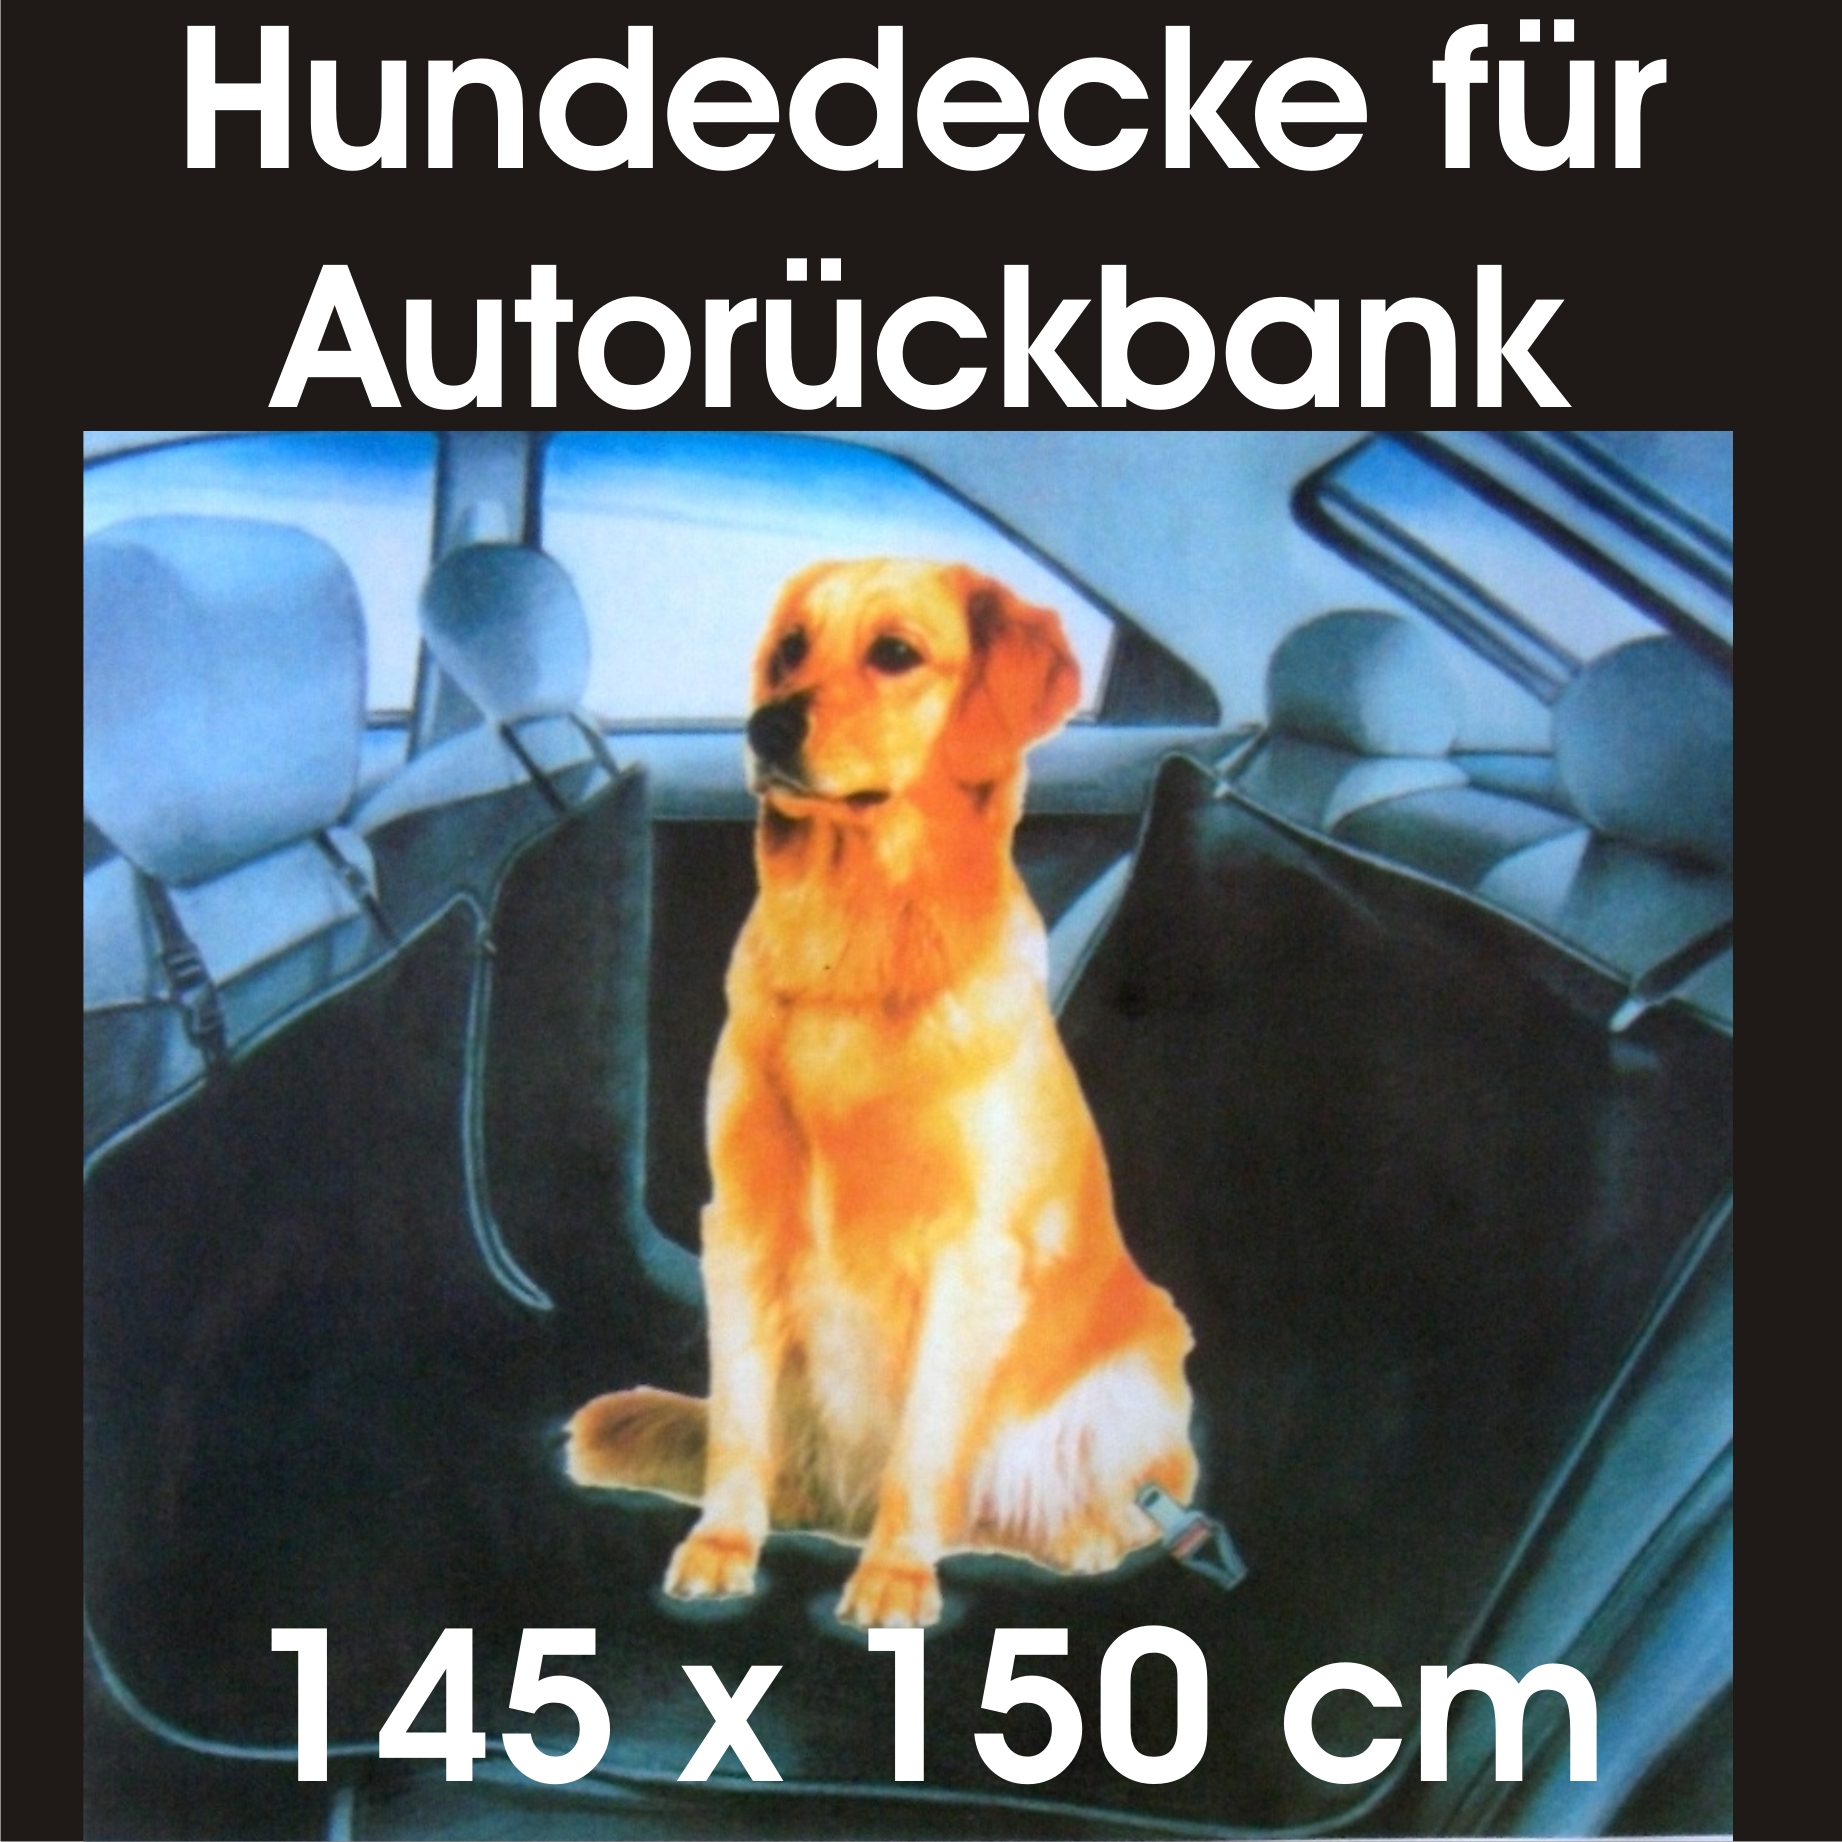 auto hunde transport kfz schutzdecke schondecke decke r cksitz r cksitzbank neu ebay. Black Bedroom Furniture Sets. Home Design Ideas